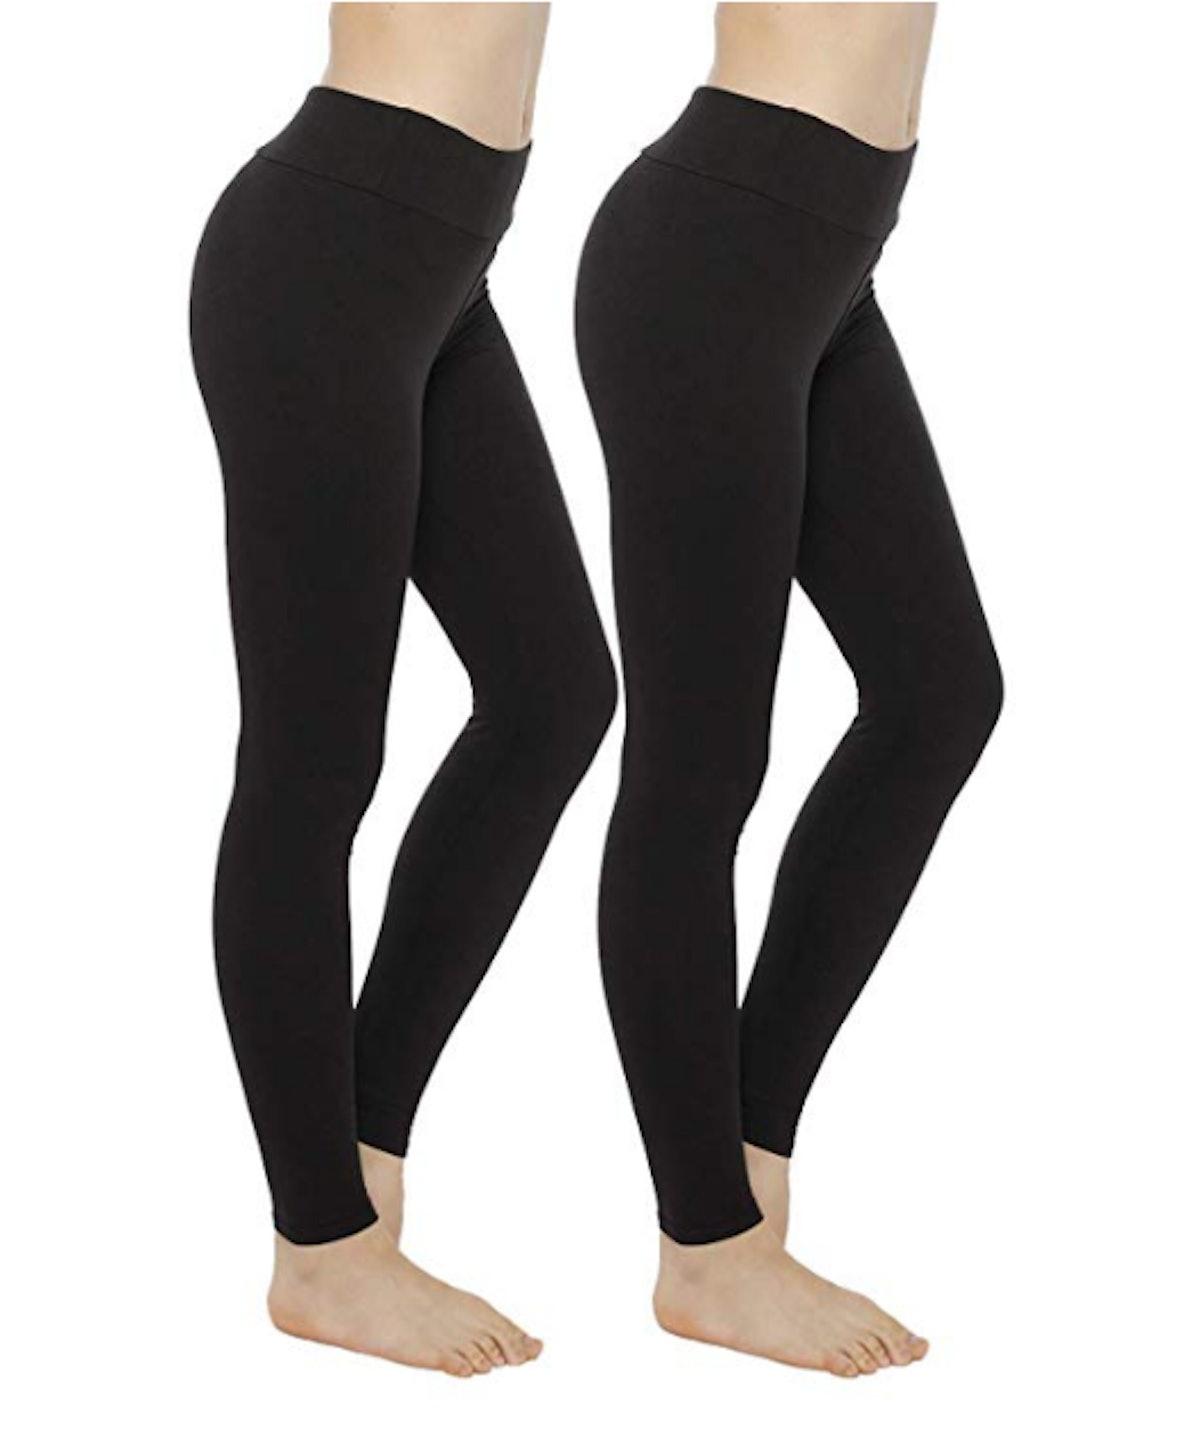 LaGoo Ultrasoft Leggings, 2 Pair